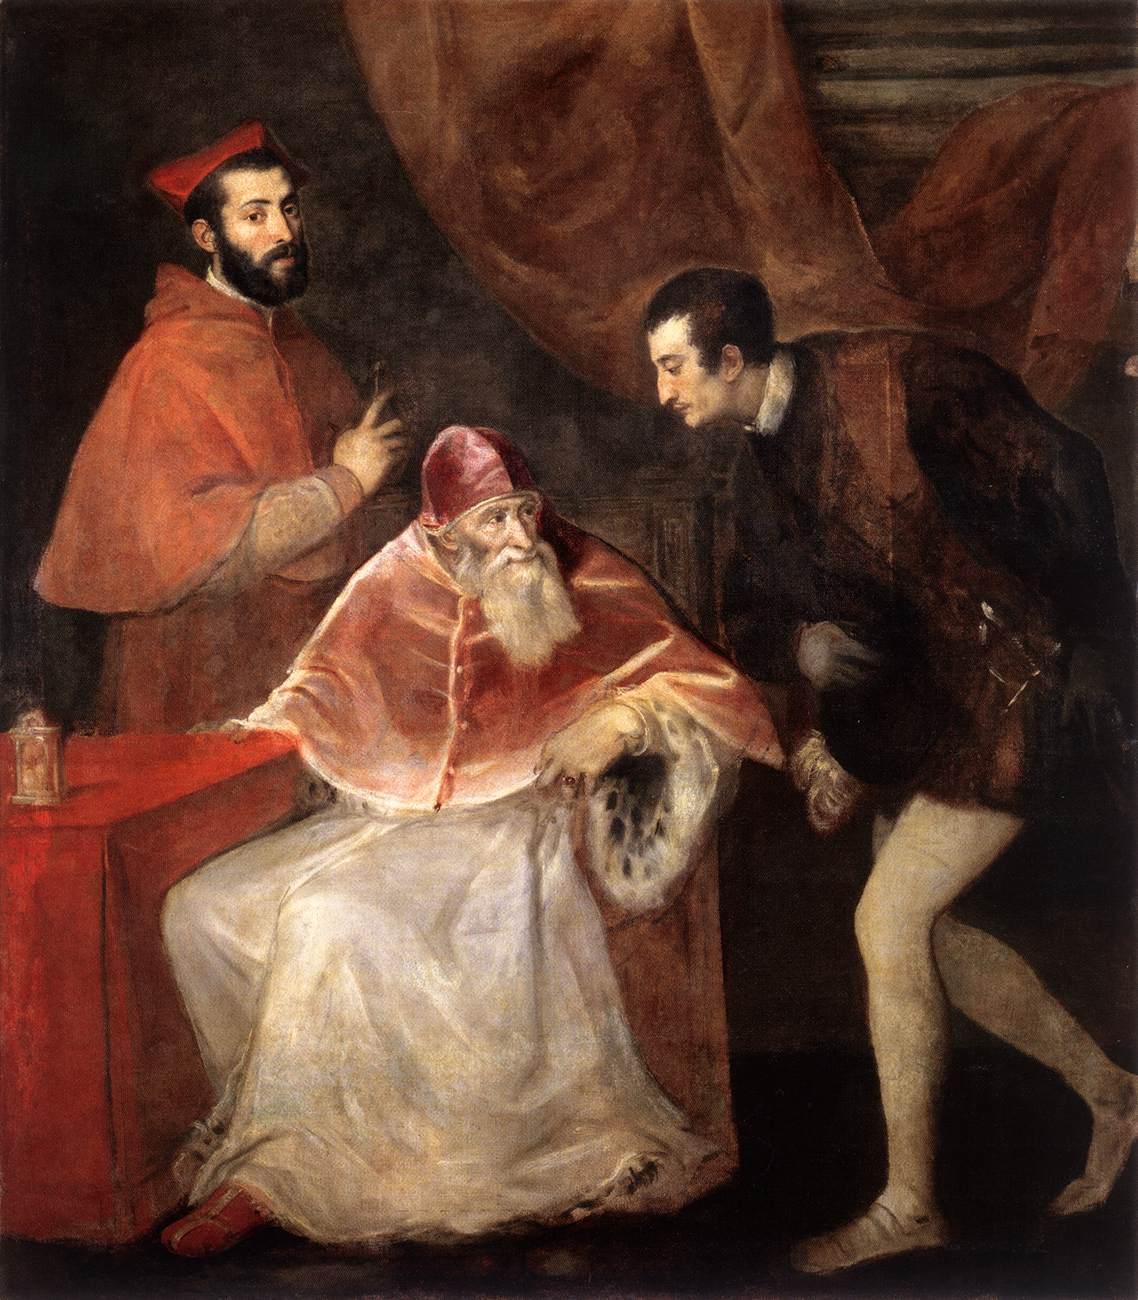 https://upload.wikimedia.org/wikipedia/commons/a/ab/Titian_-_Pope_Paul_III_with_his_Grandsons_Alessandro_and_Ottavio_Farnese_-_WGA22985.jpg